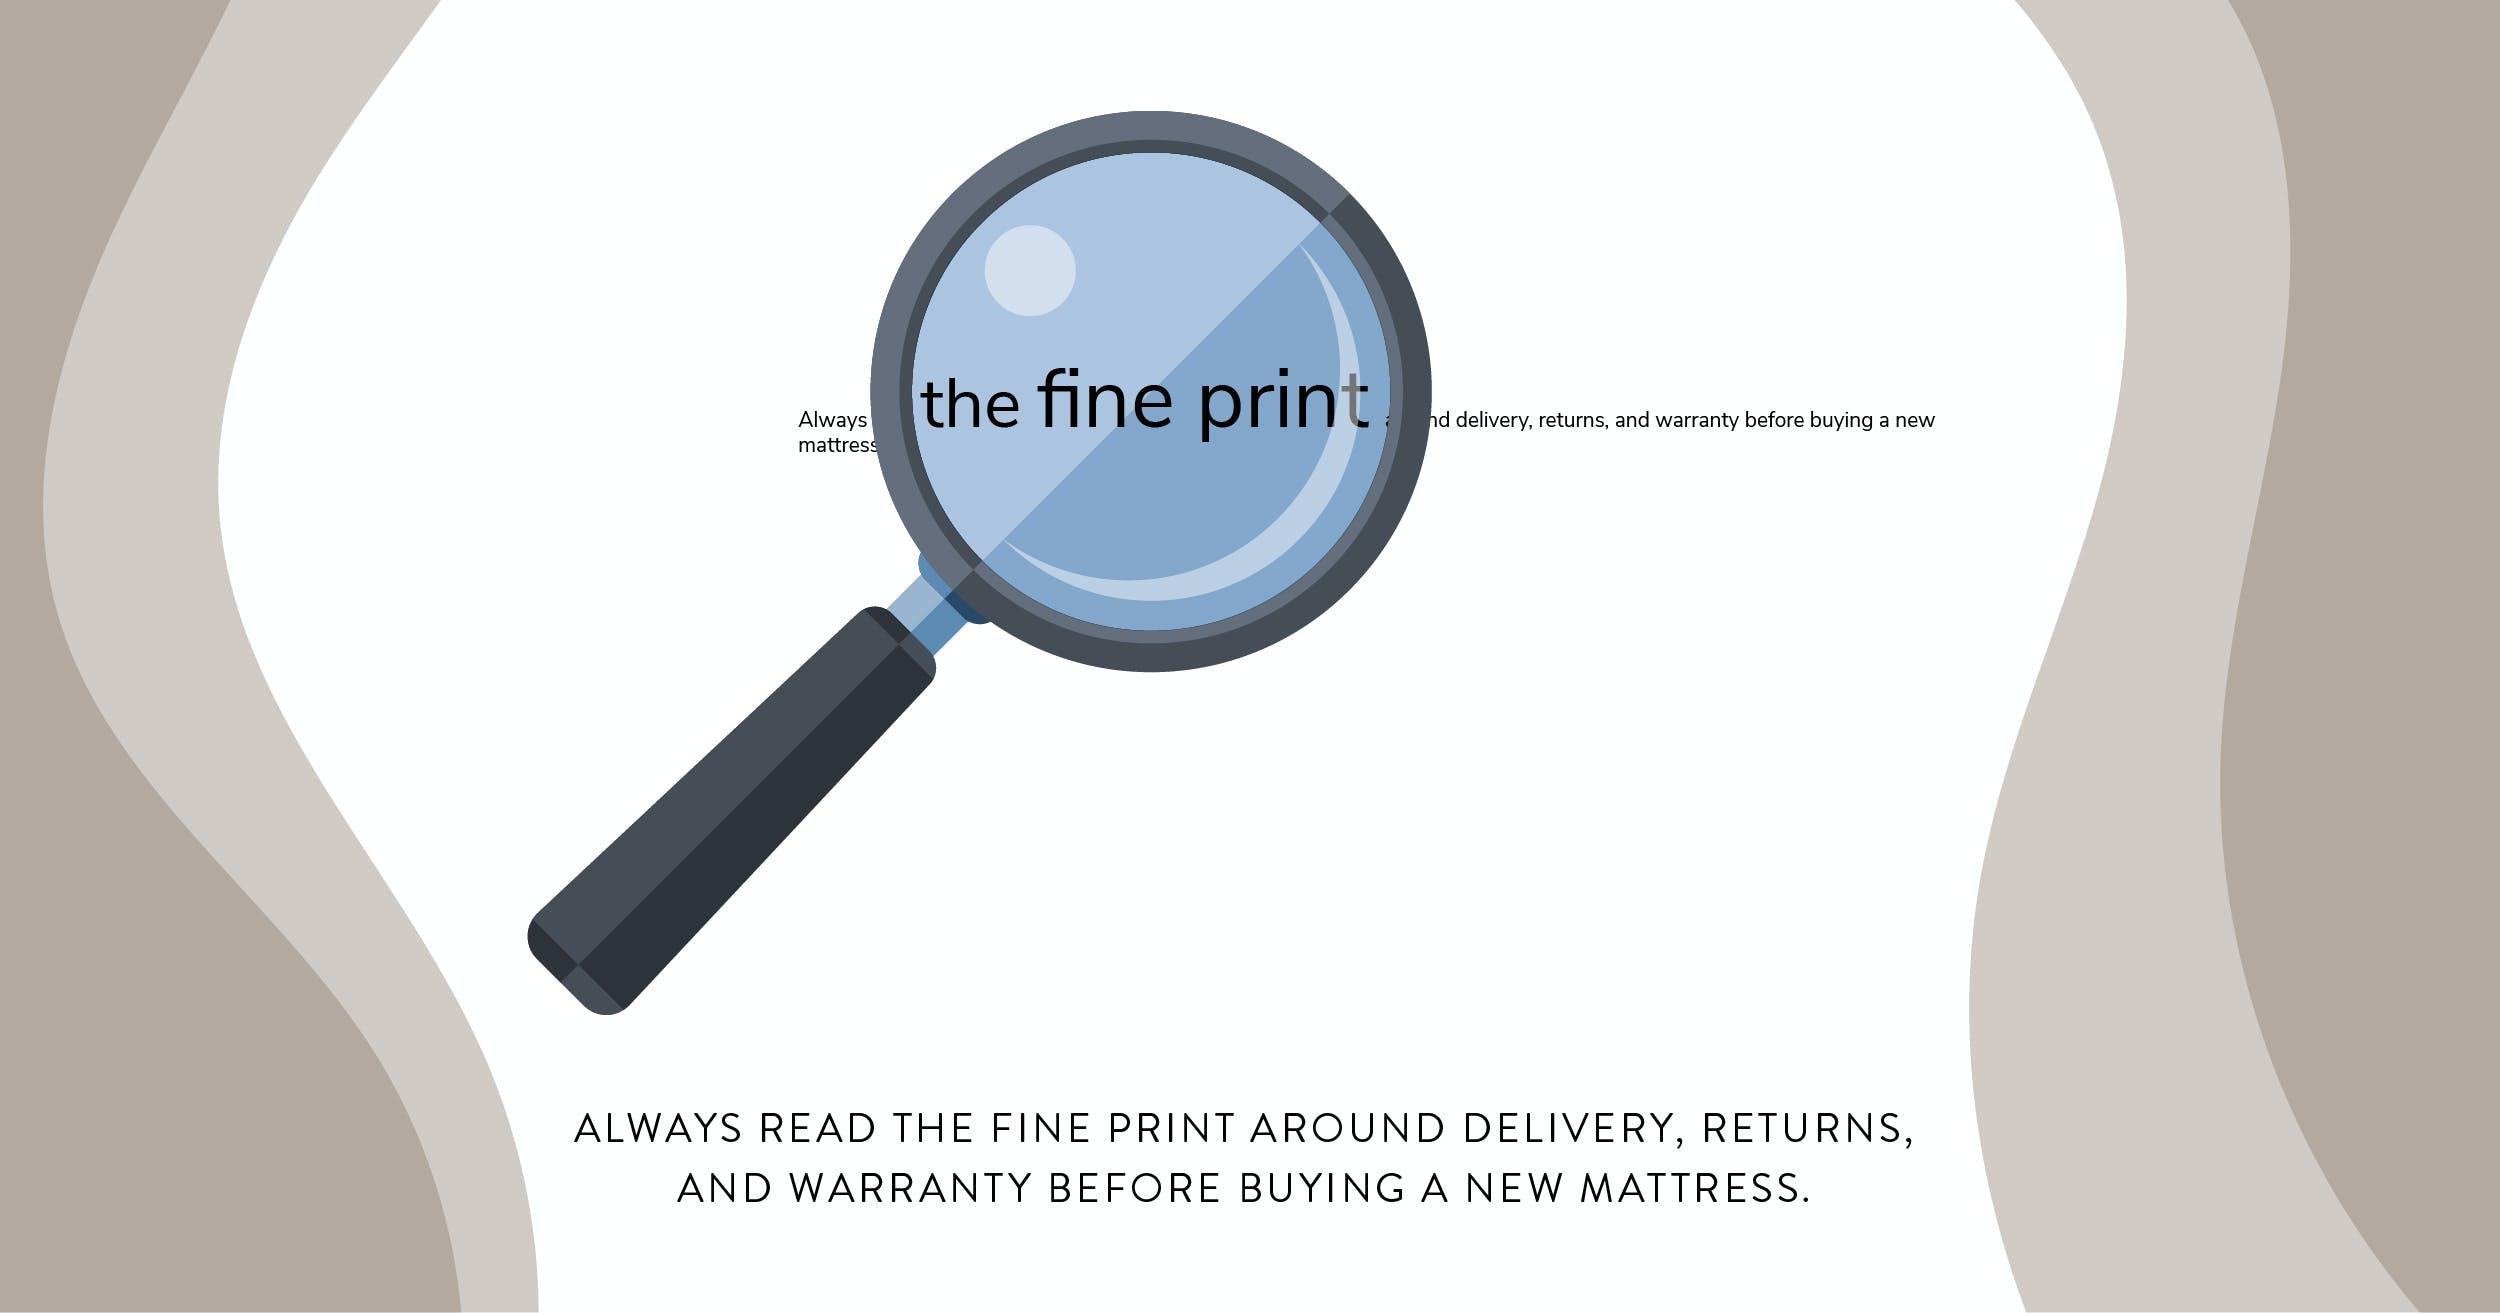 illustration showing mattress fine print policies